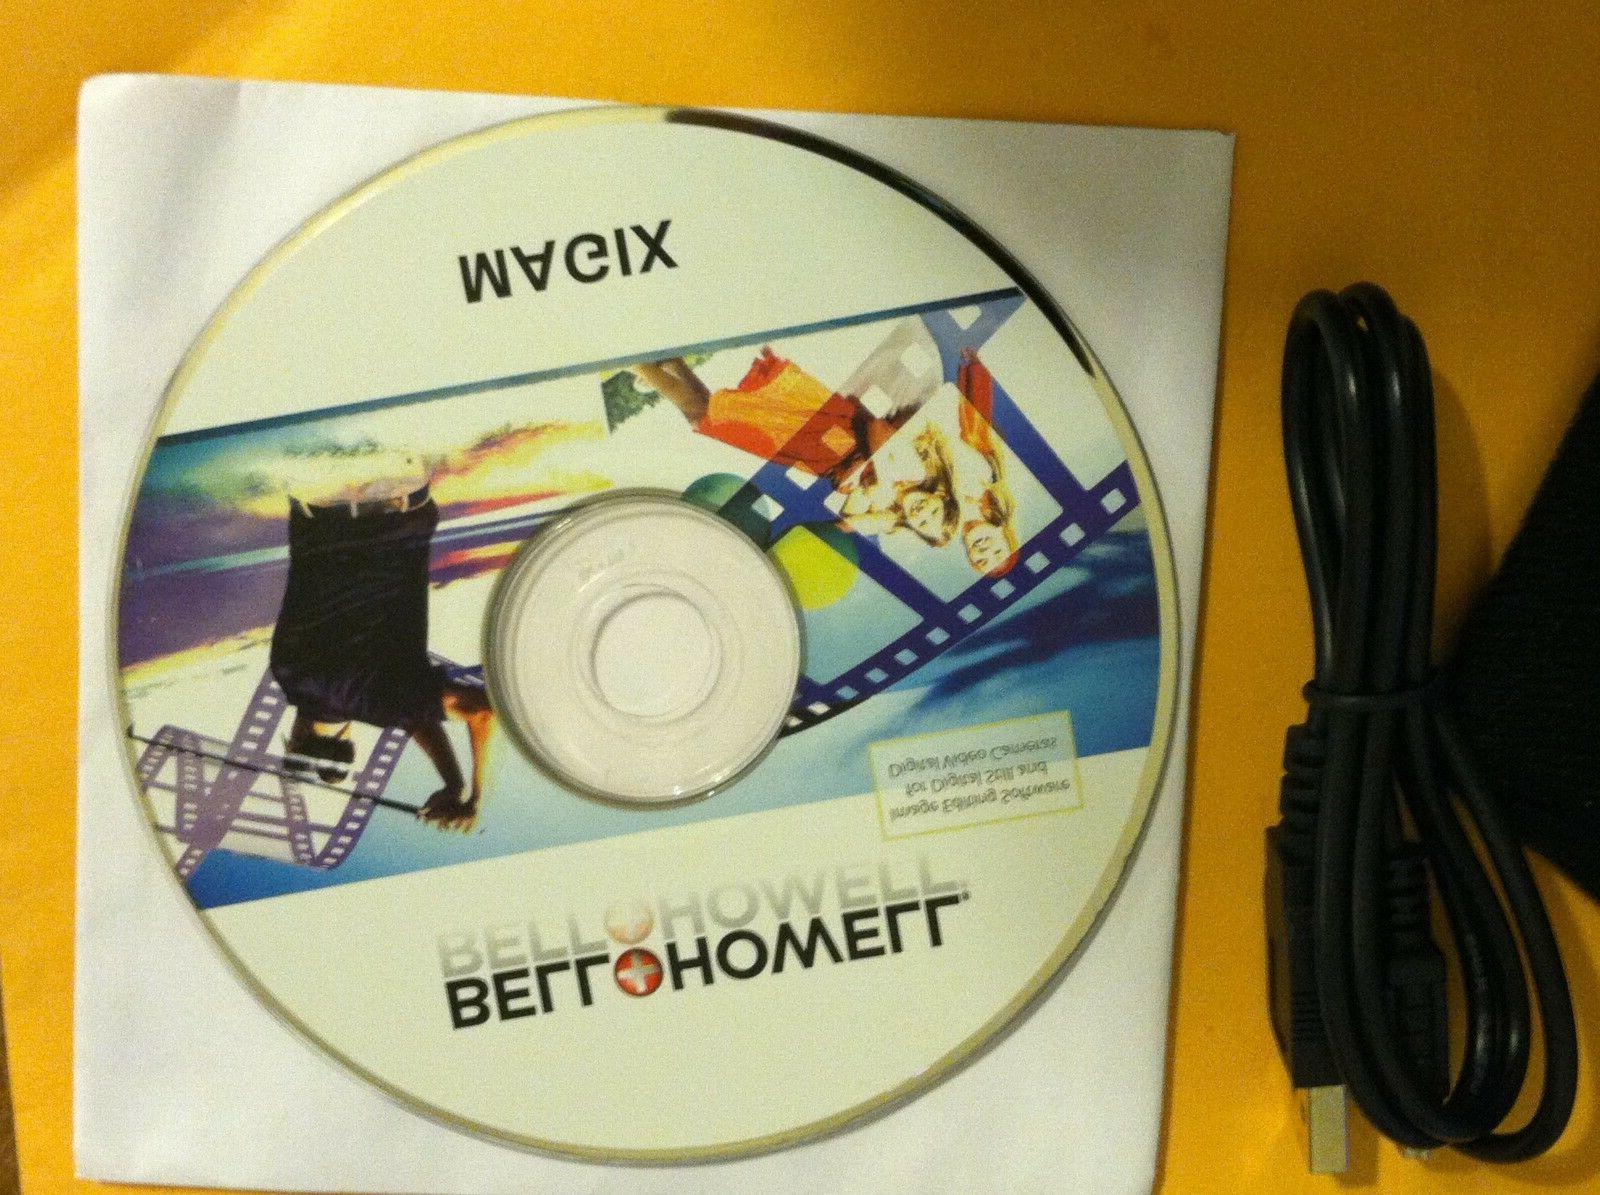 Bell & Fun-Flix 5.0MP Camera -